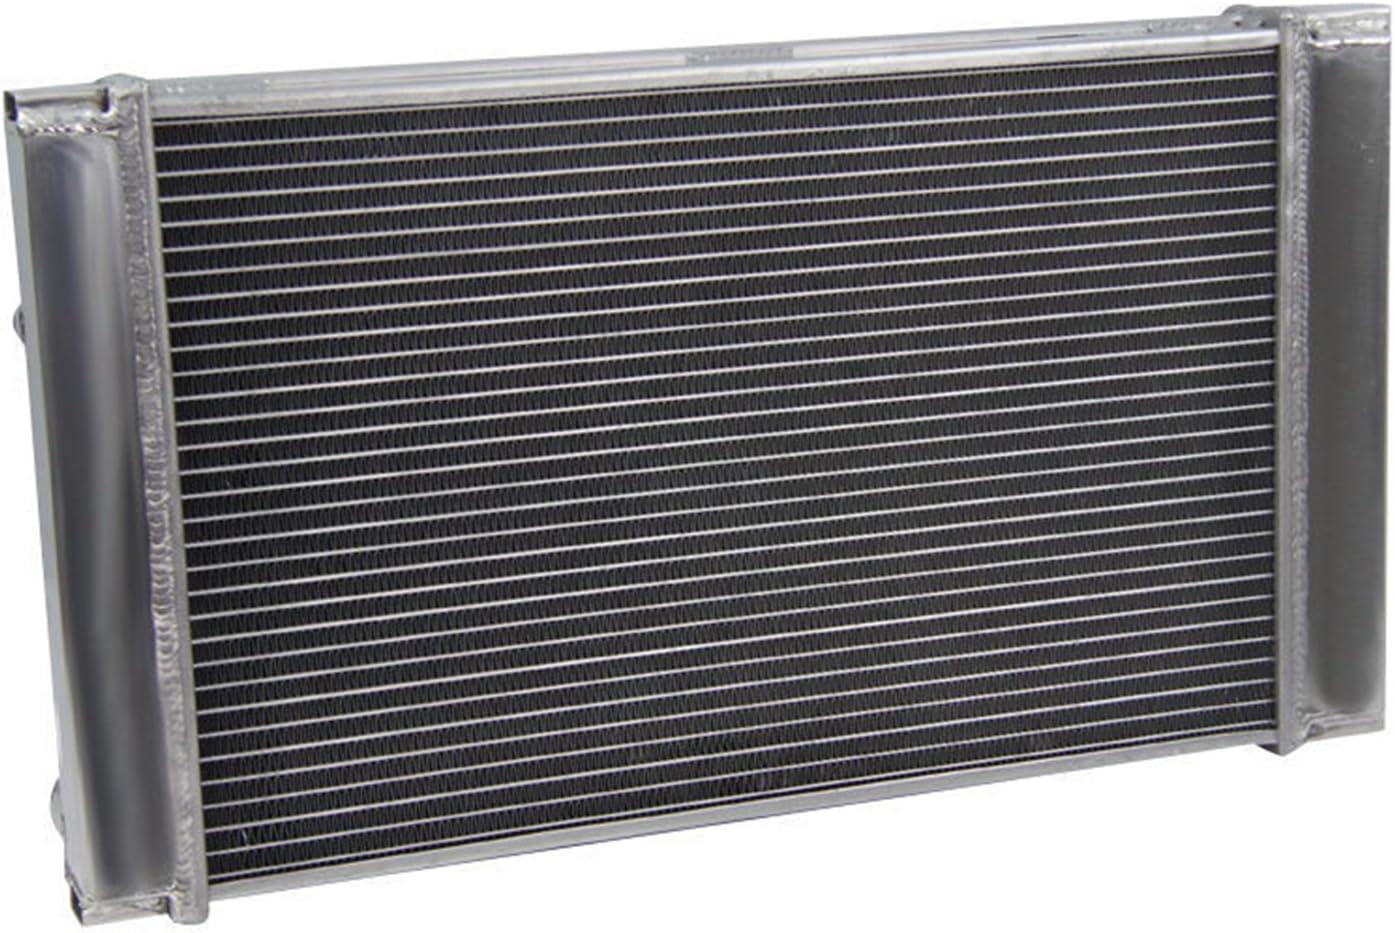 3 ROW Aluminum Radiator For 1985-1991 PORSCHE 944 2.5L 944 TURBO S2 3.0L AT USA